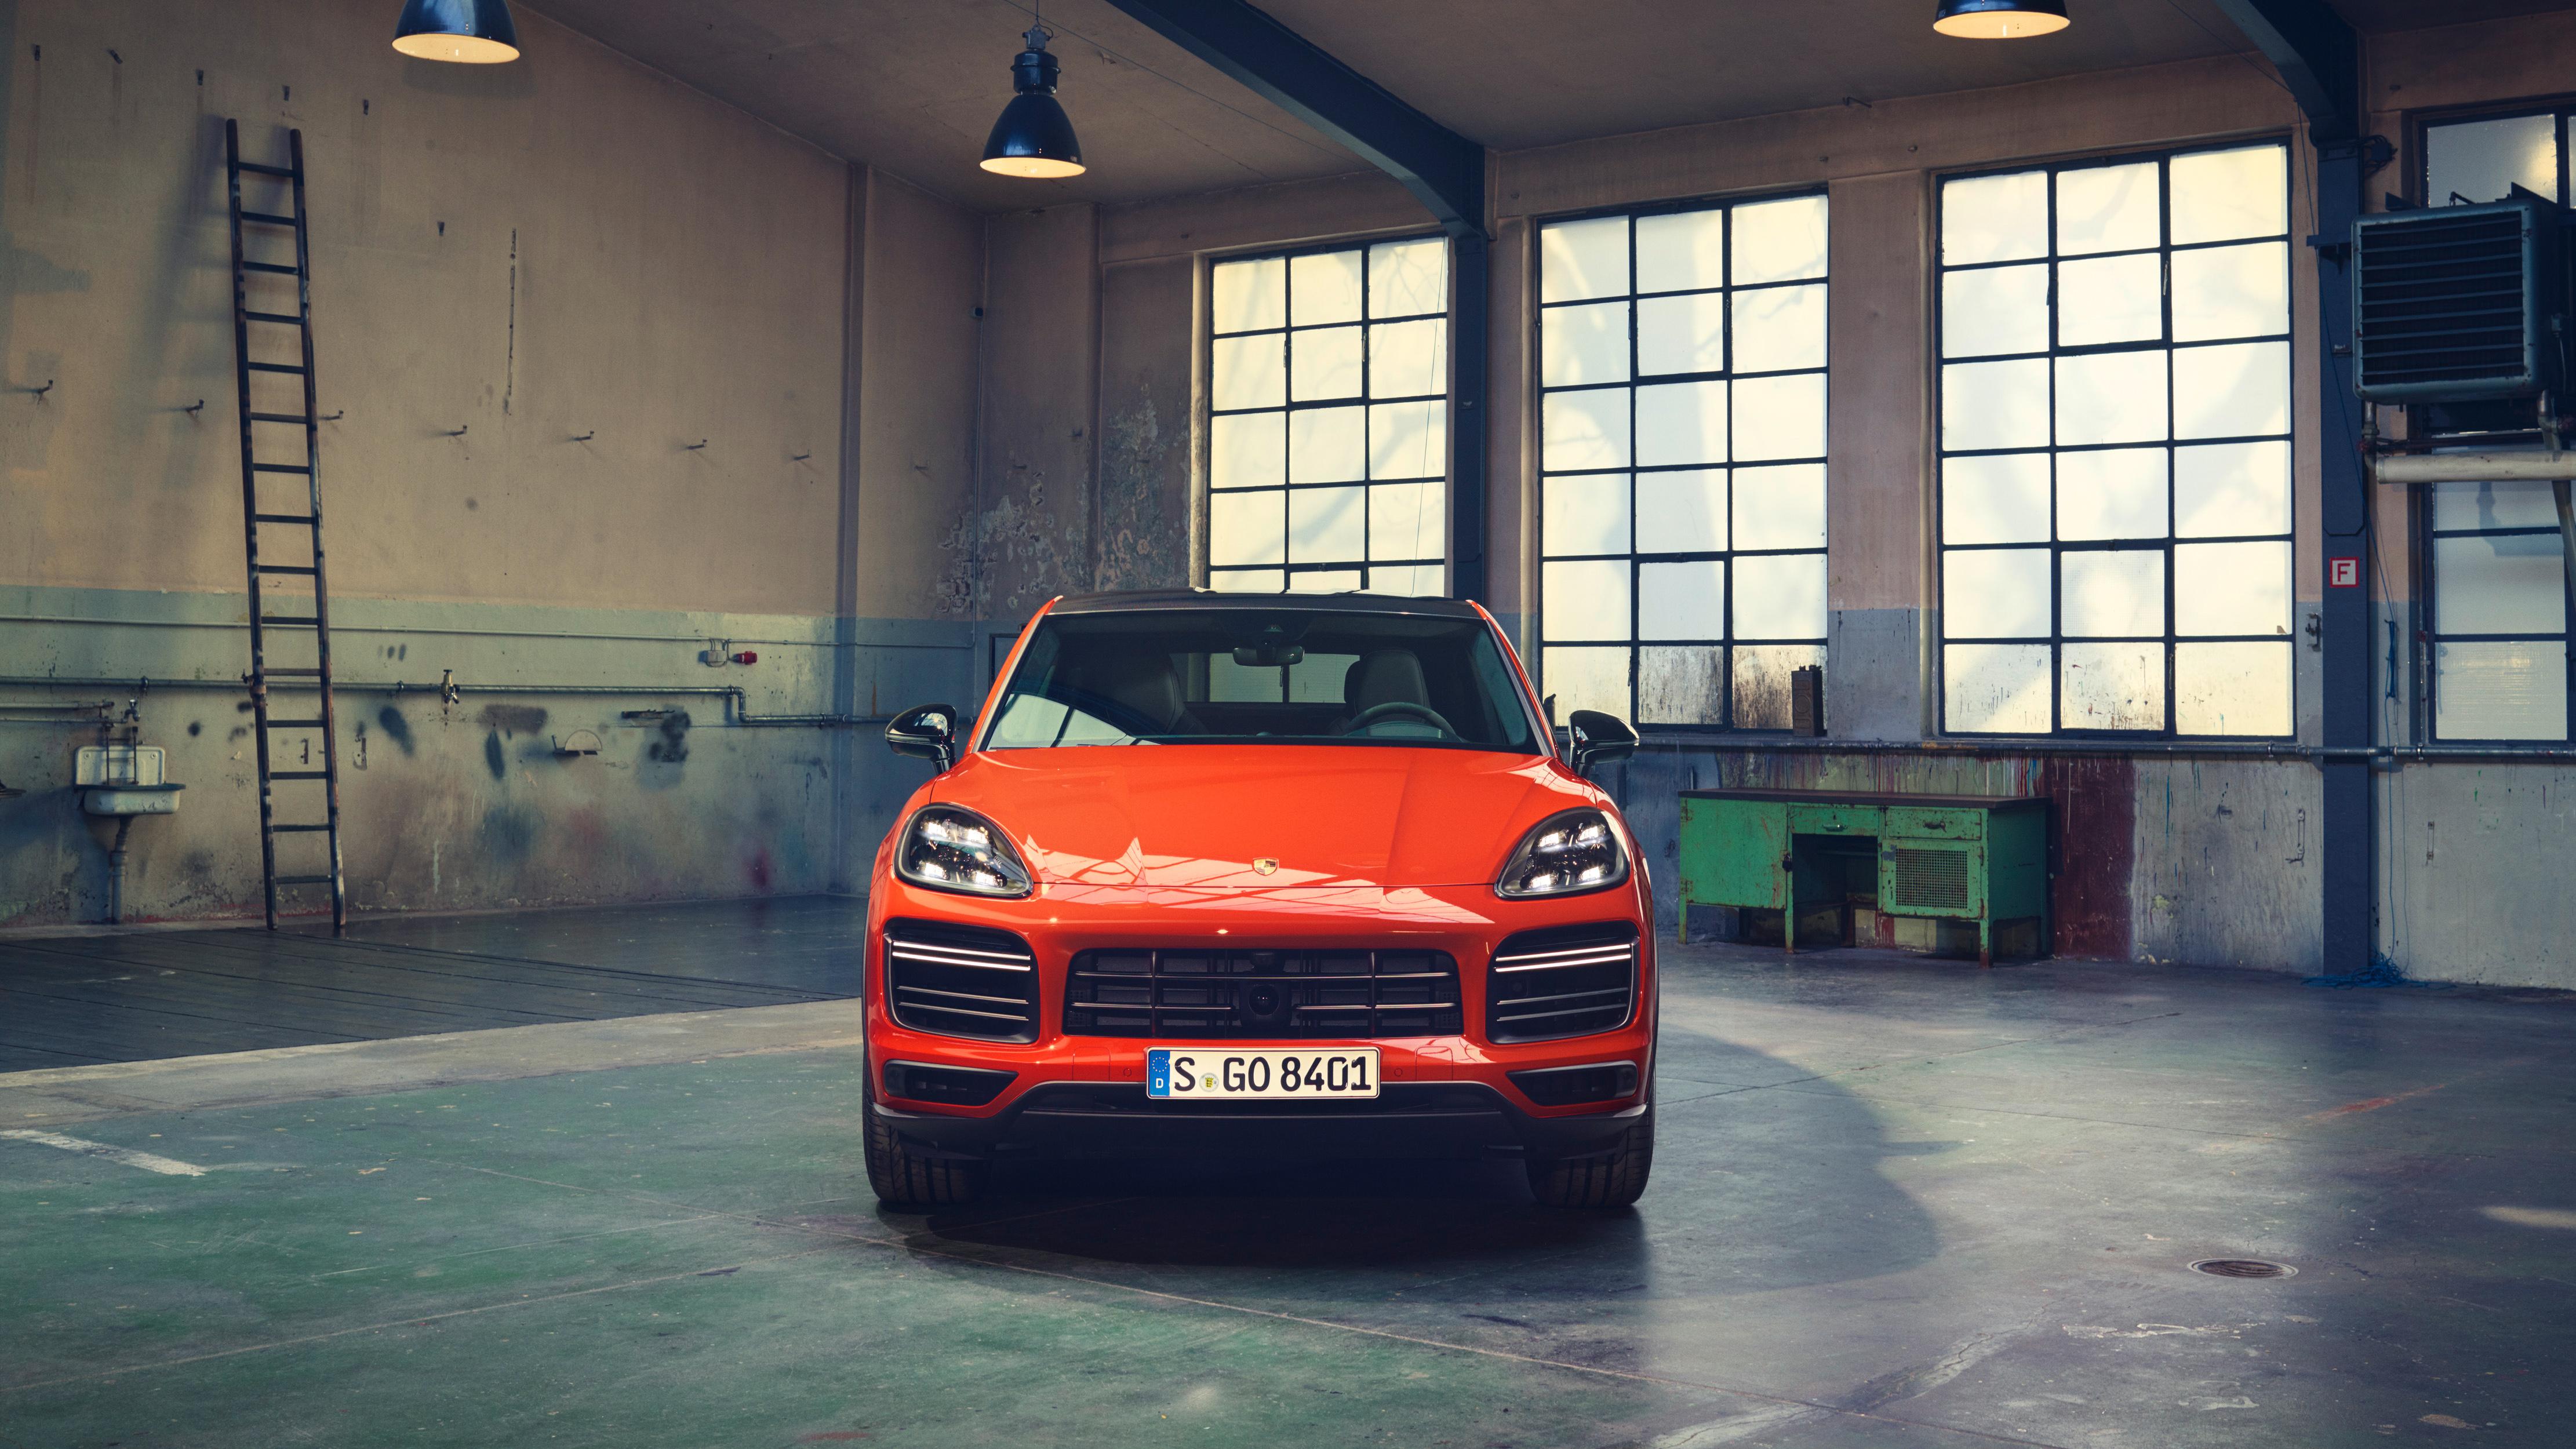 Porsche Cayenne Turbo Coupe 2019 4K Wallpaper HD Car Wallpapers 4444x2500